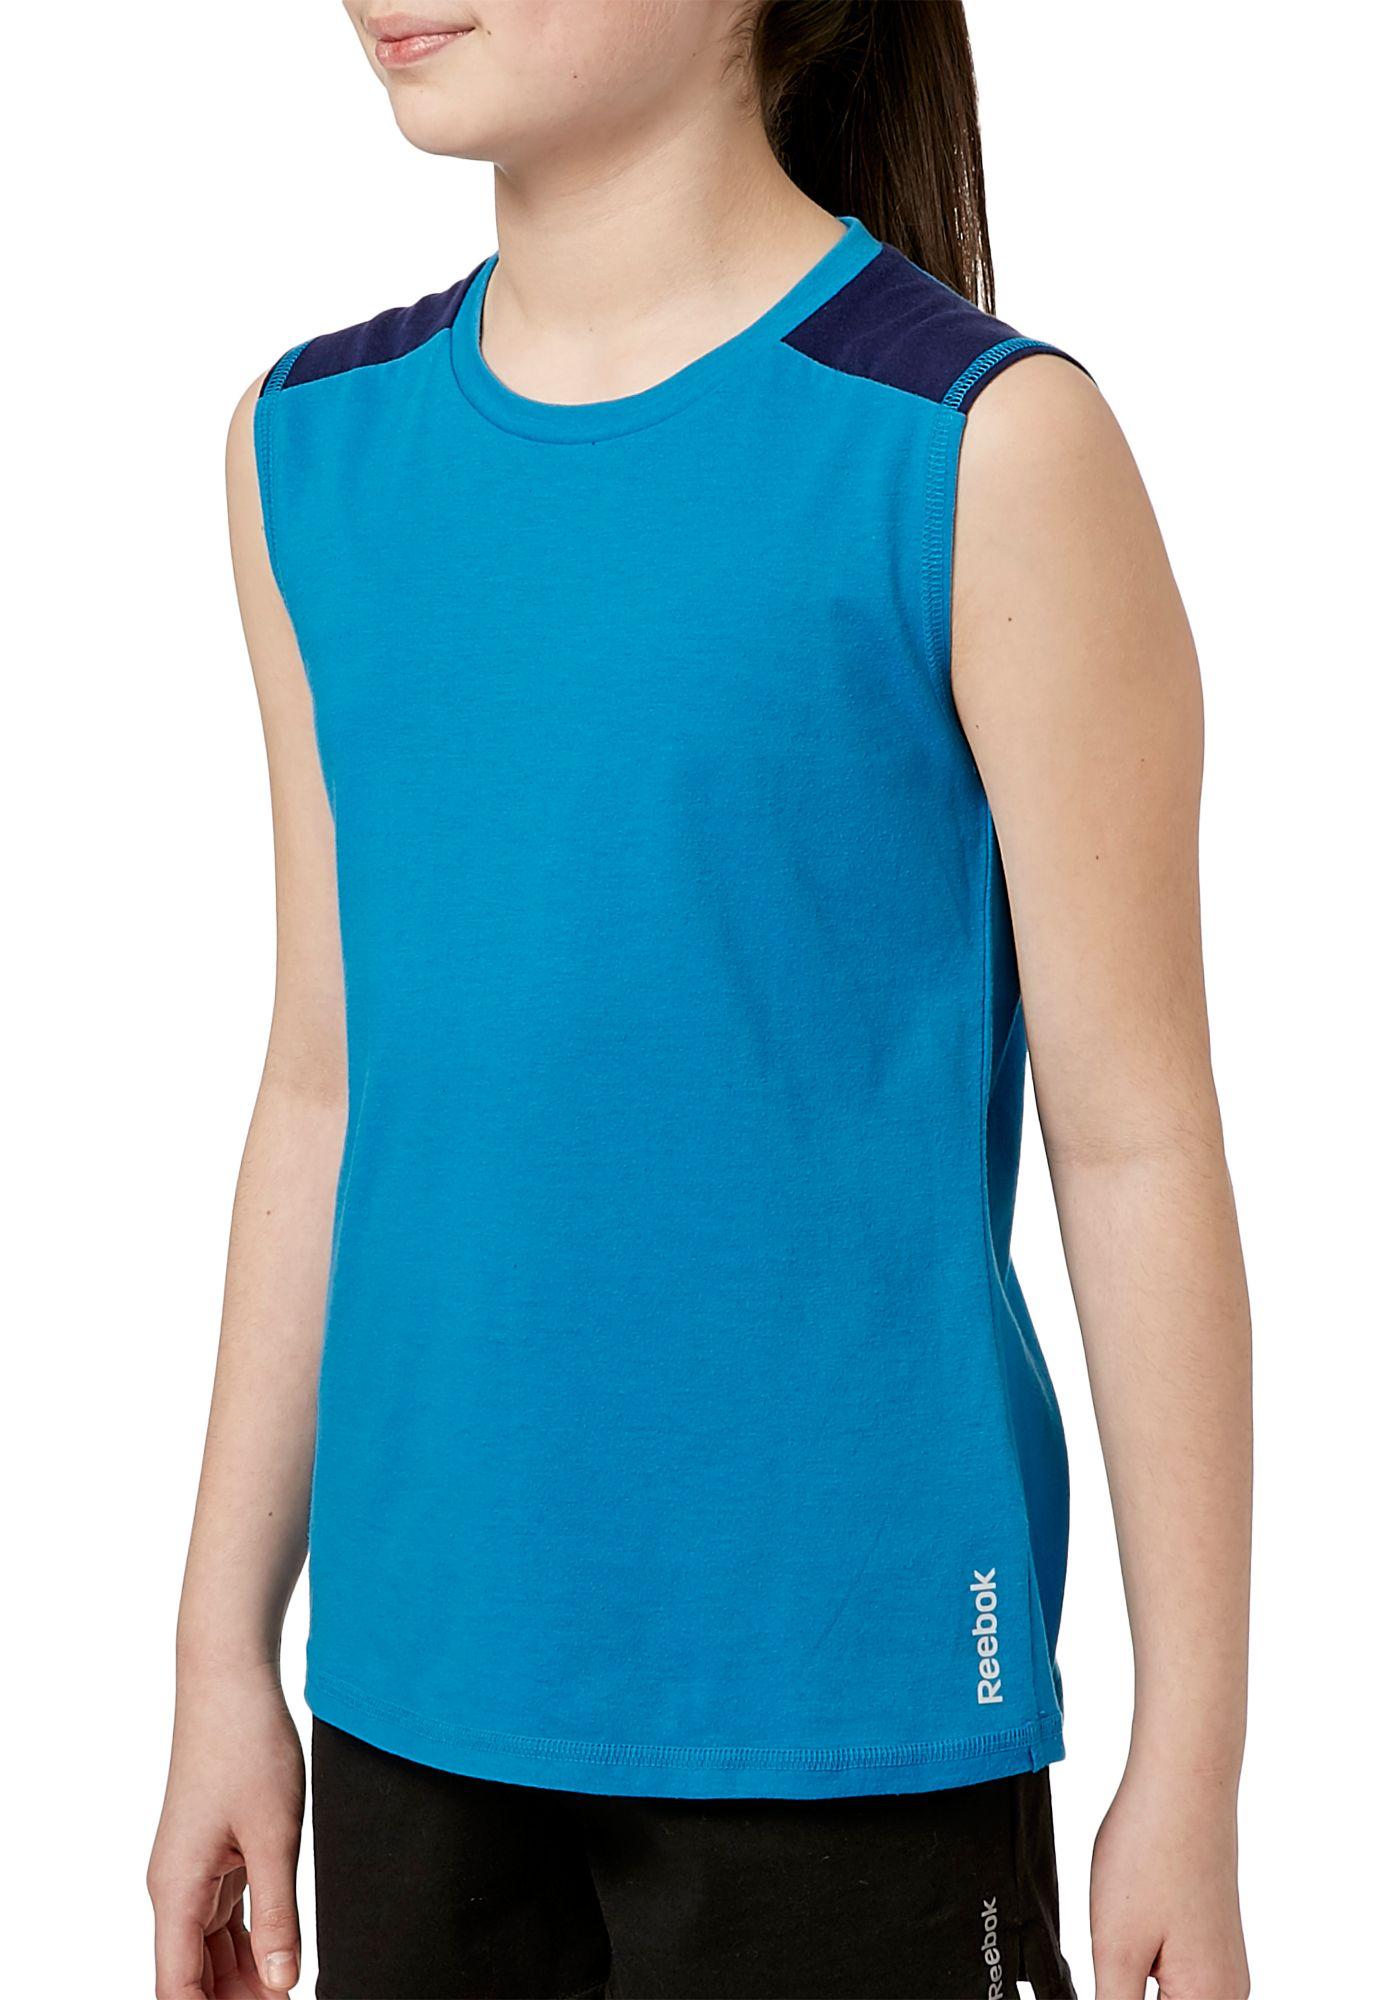 Reebok Girls' Cotton Muscle Tank Top